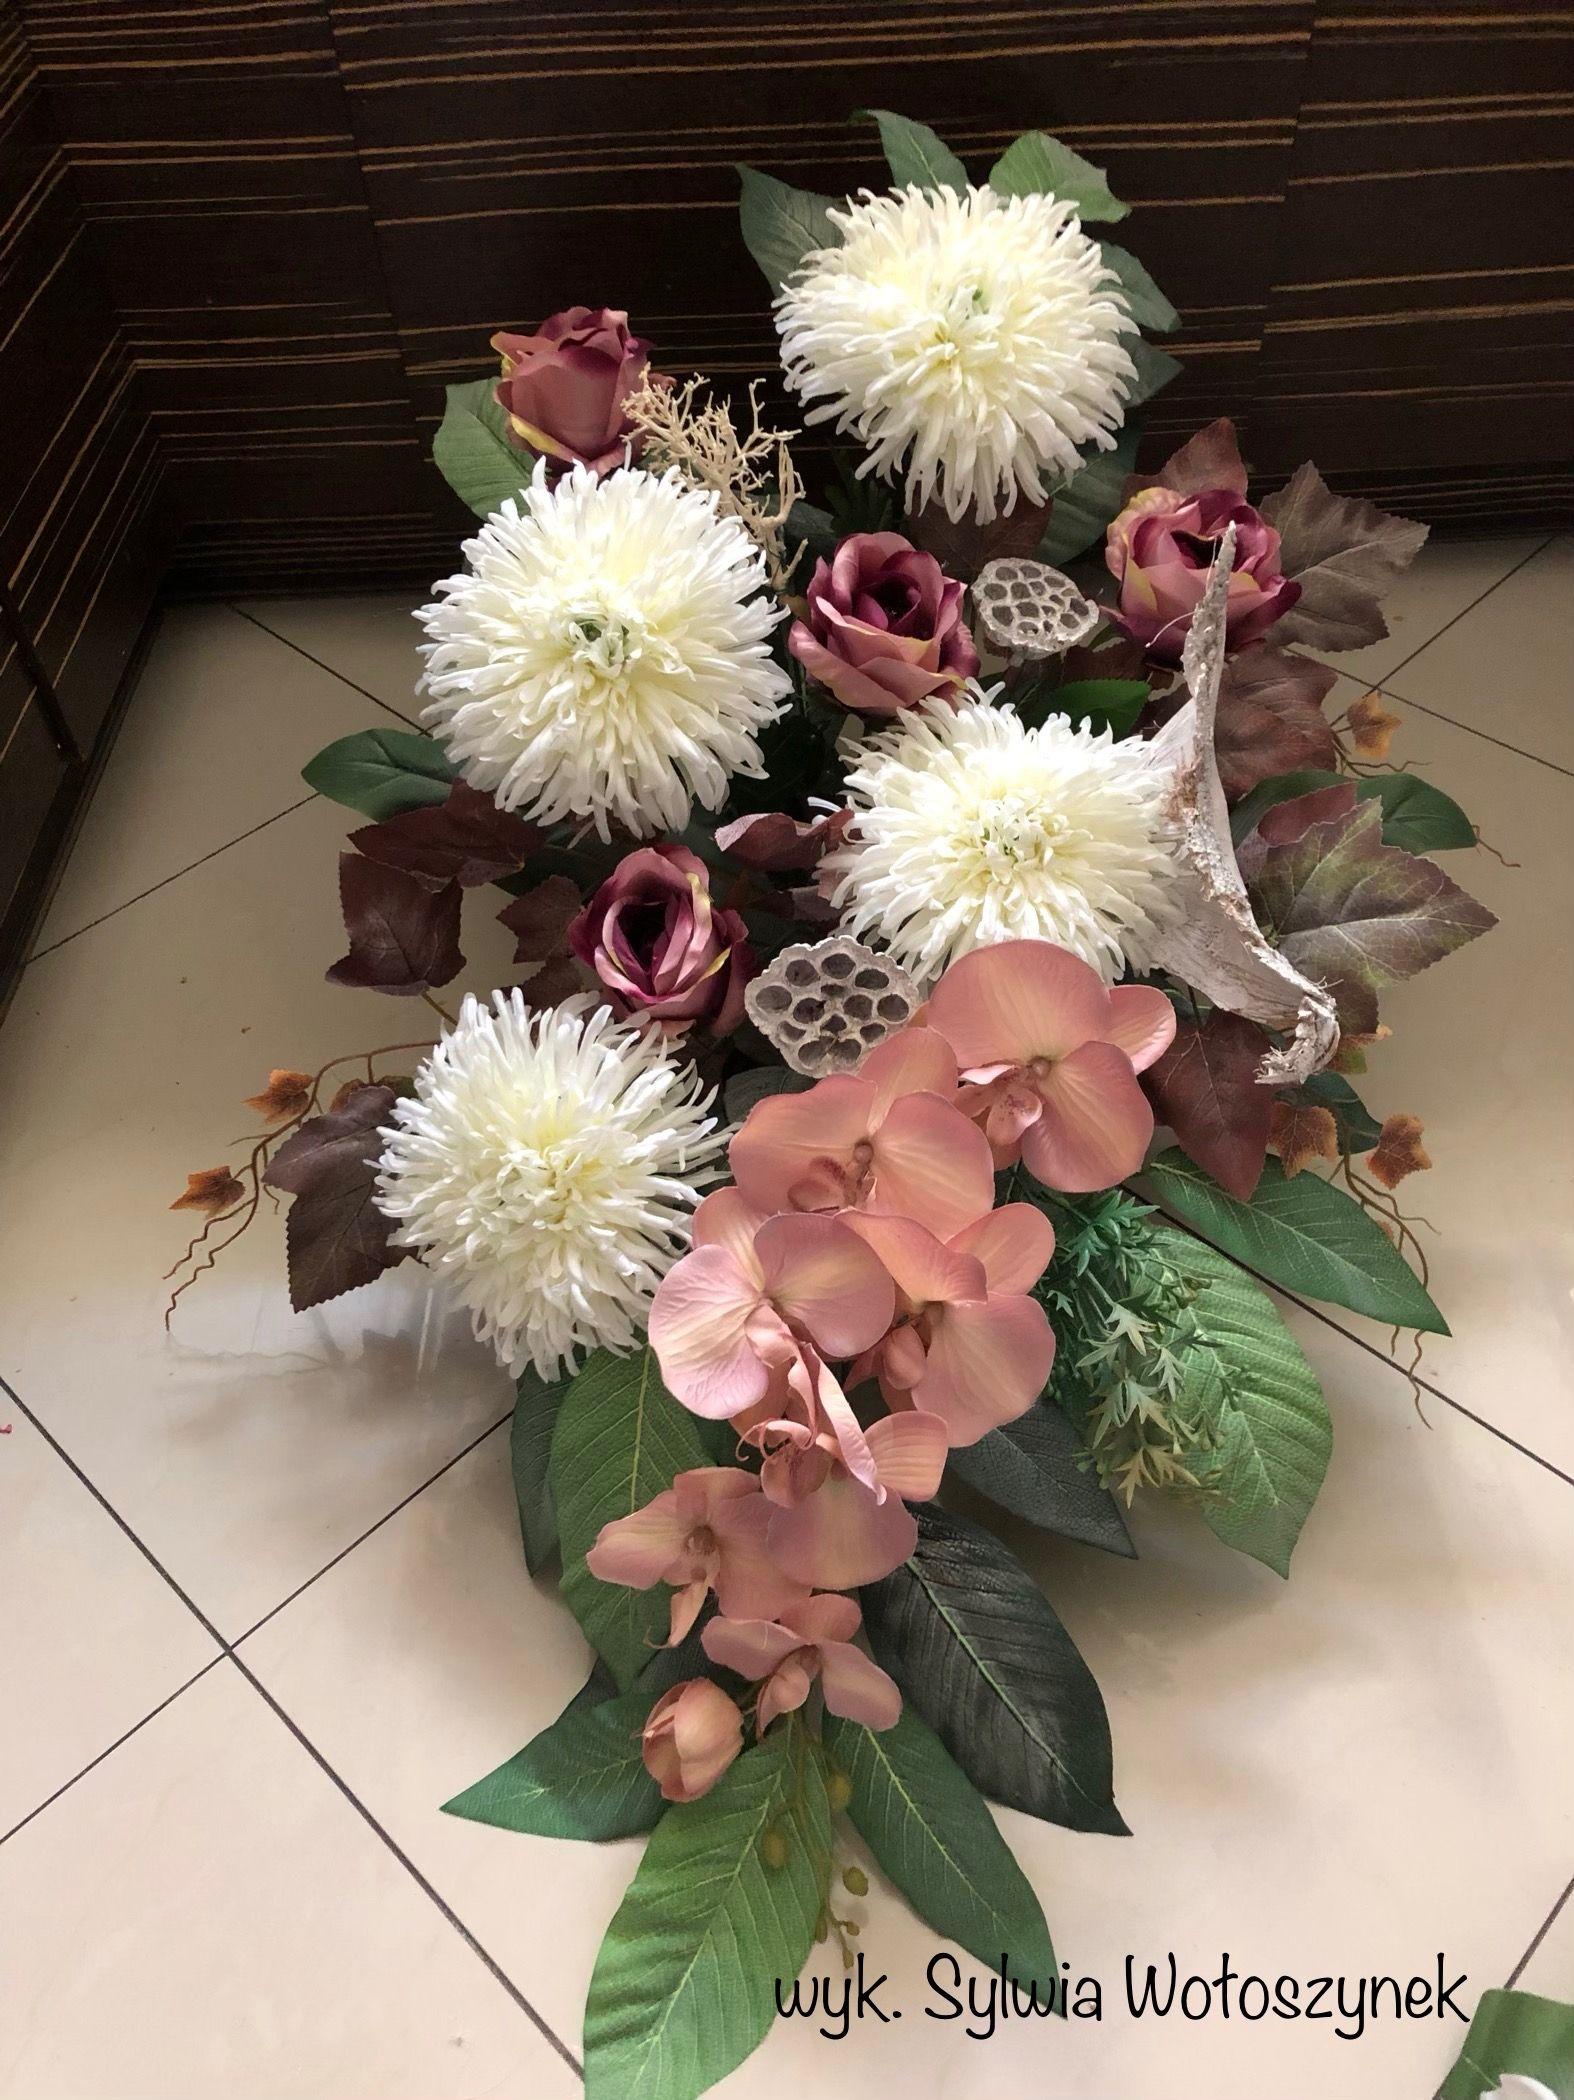 Kompozycja Nagrobna 2018 Wyk Sylwia Woloszynek Flower Arrangements Floral Arrangements Grave Decorations